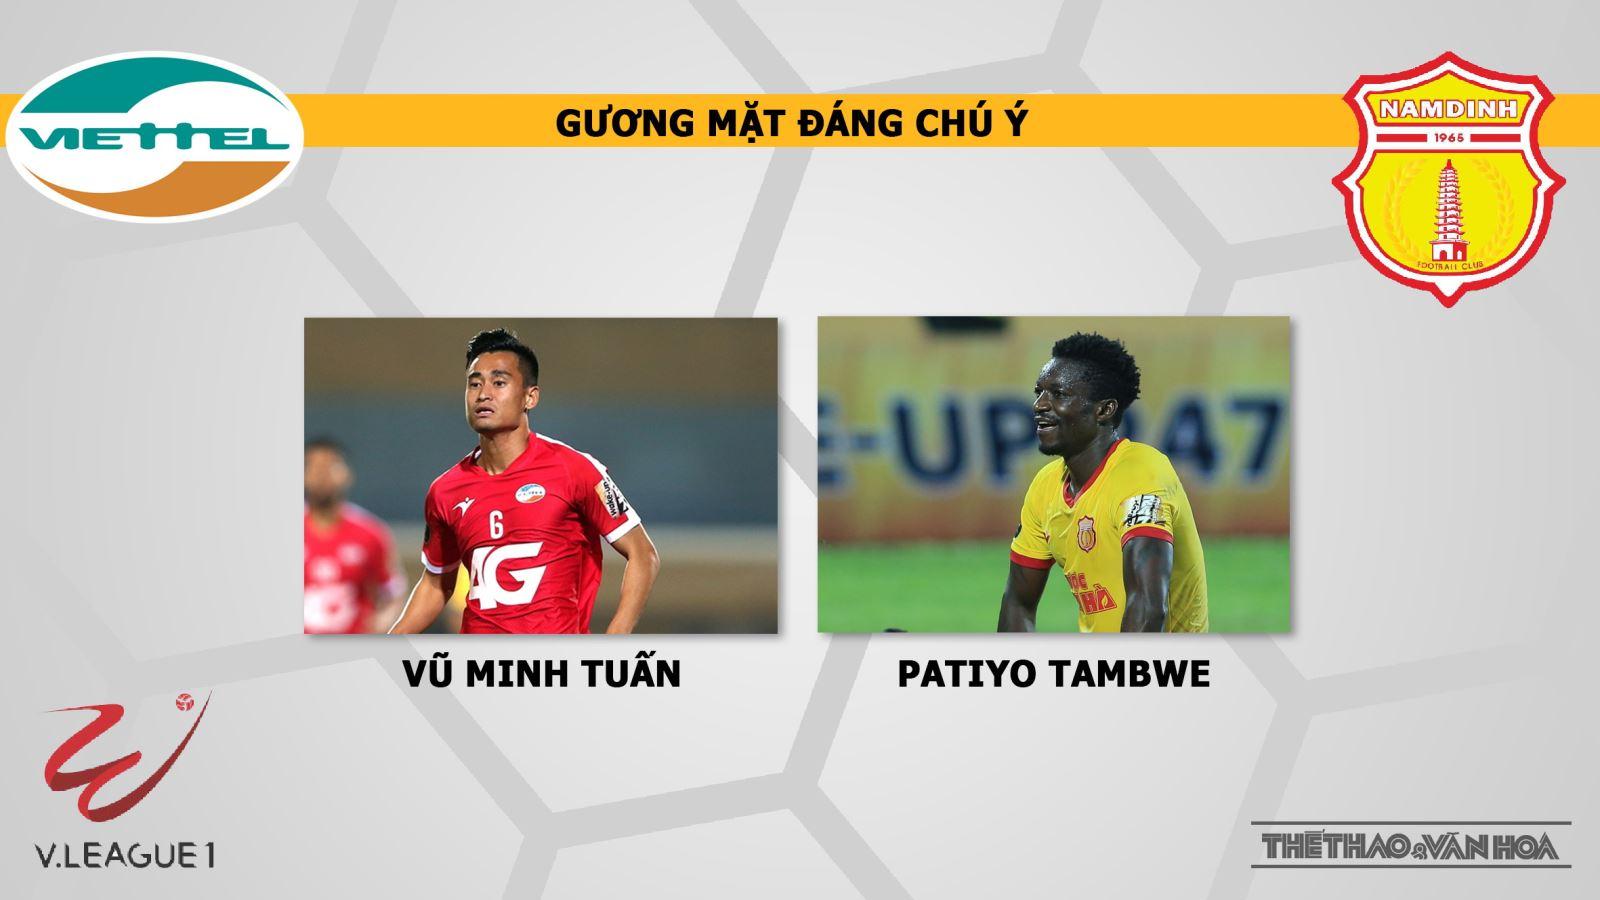 Viettel, Viettel vs Nam Định, truc tiep bong da, trực tiếp bóng đá, truc tiep Viettel vs Nam Dinh, VTV6, Nam Định, link truc tiep Viettel, xem truc tiep VLeague 2019, FPT